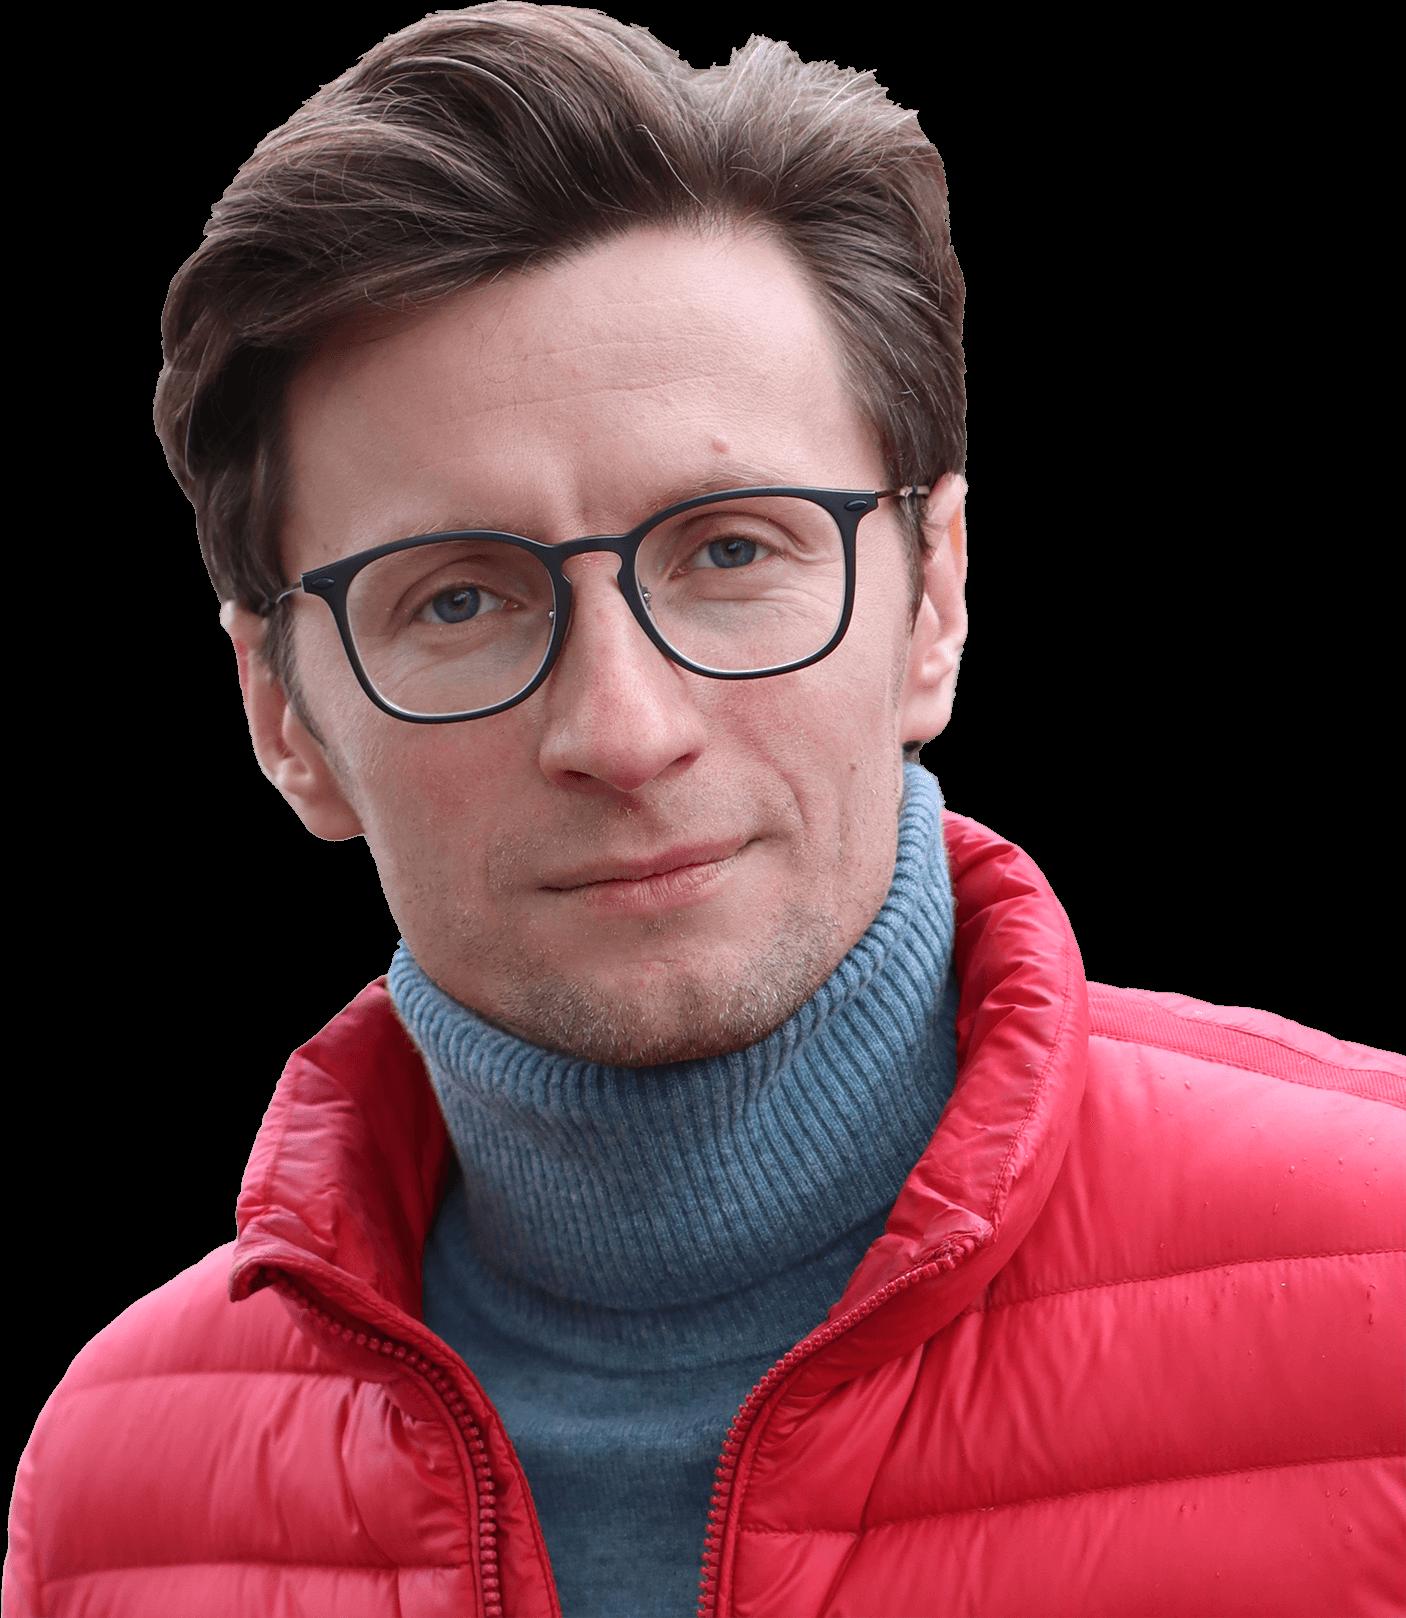 Руслан Галка, маркетолог, практик, Ruslan Galka, писатель